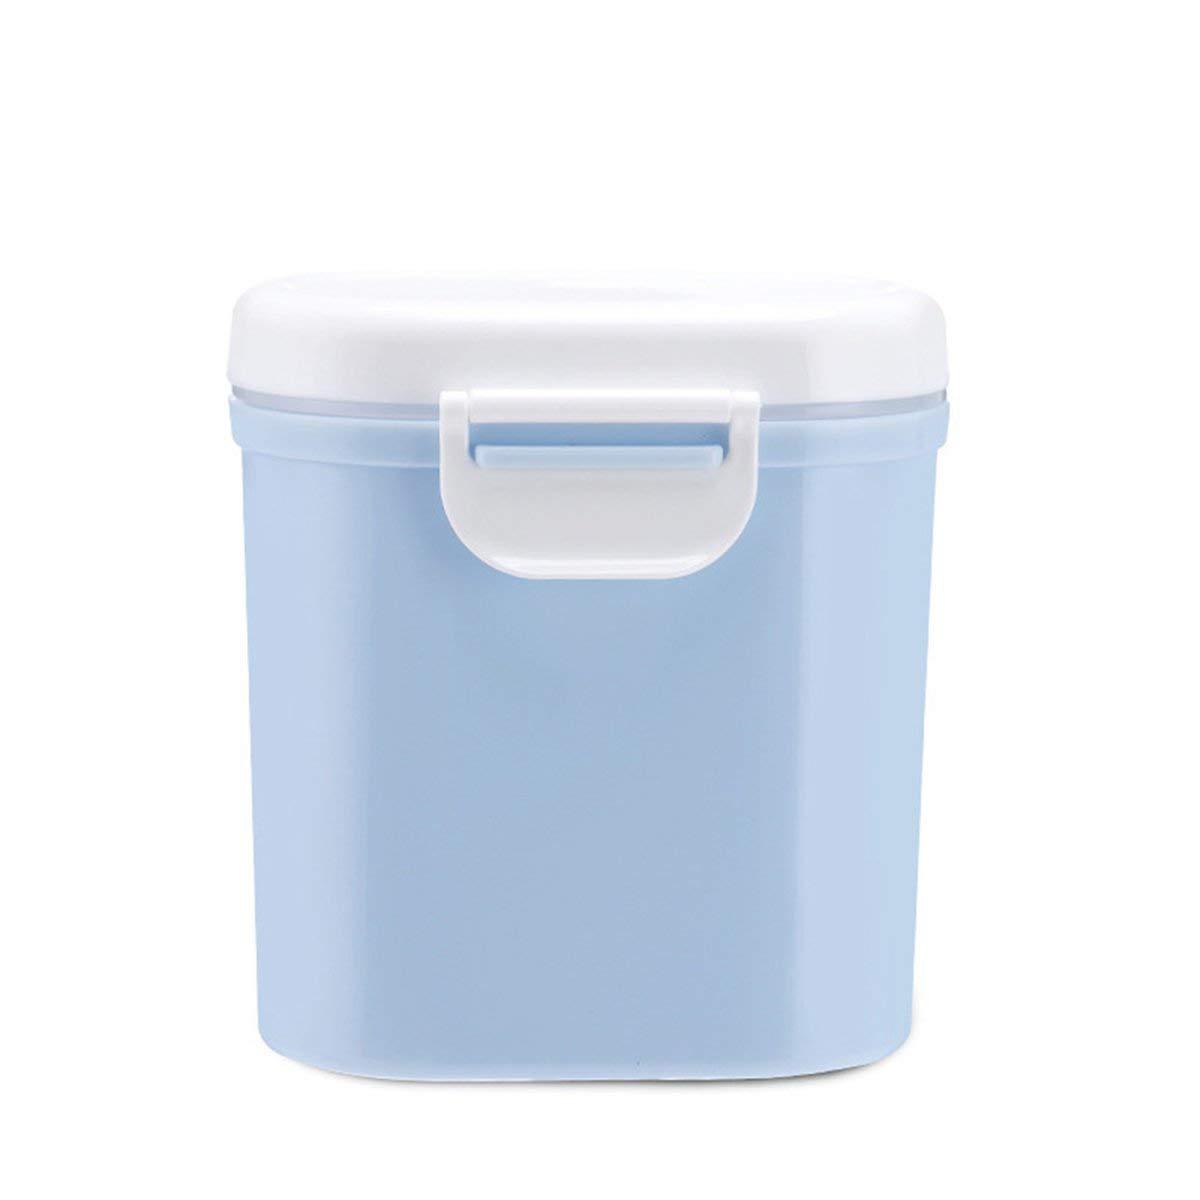 contenedor Organizador Tanque Caja de recepci/ón Gugutogo Caja de Almacenamiento sellada port/átil al Aire Libre de Gran Capacidad para beb/és Leche en Polvo para beb/és